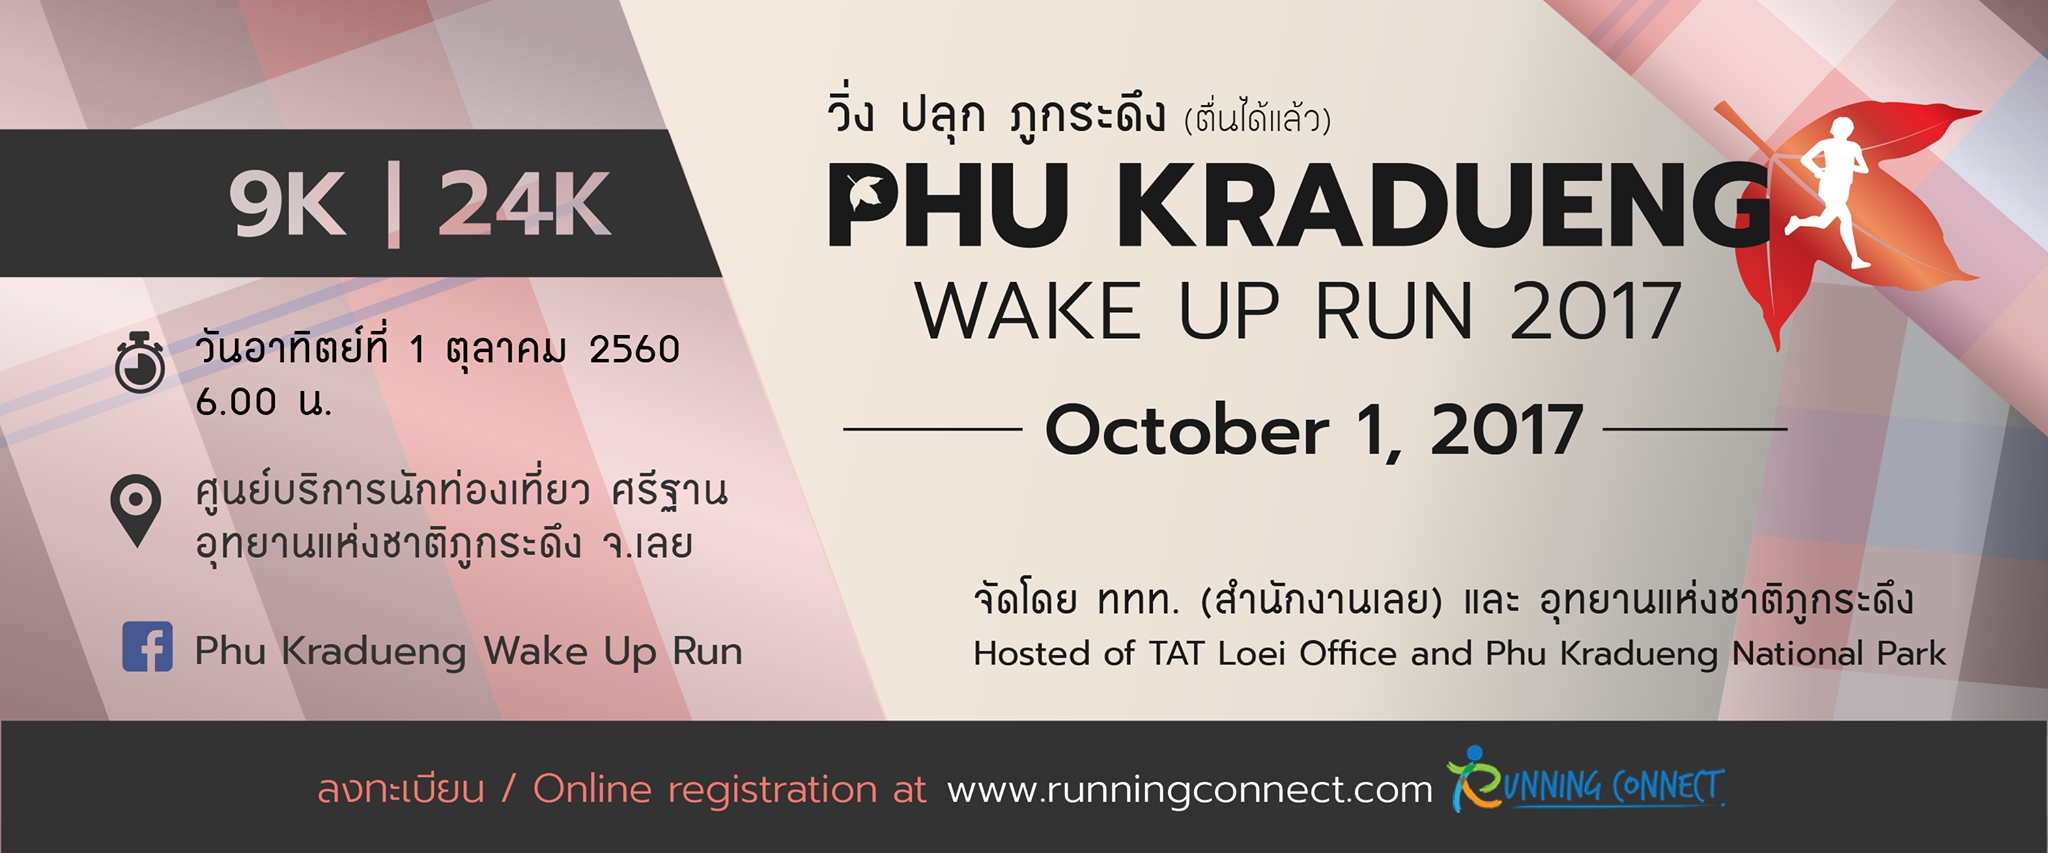 Phu Kradueng Wake Up Run 2017